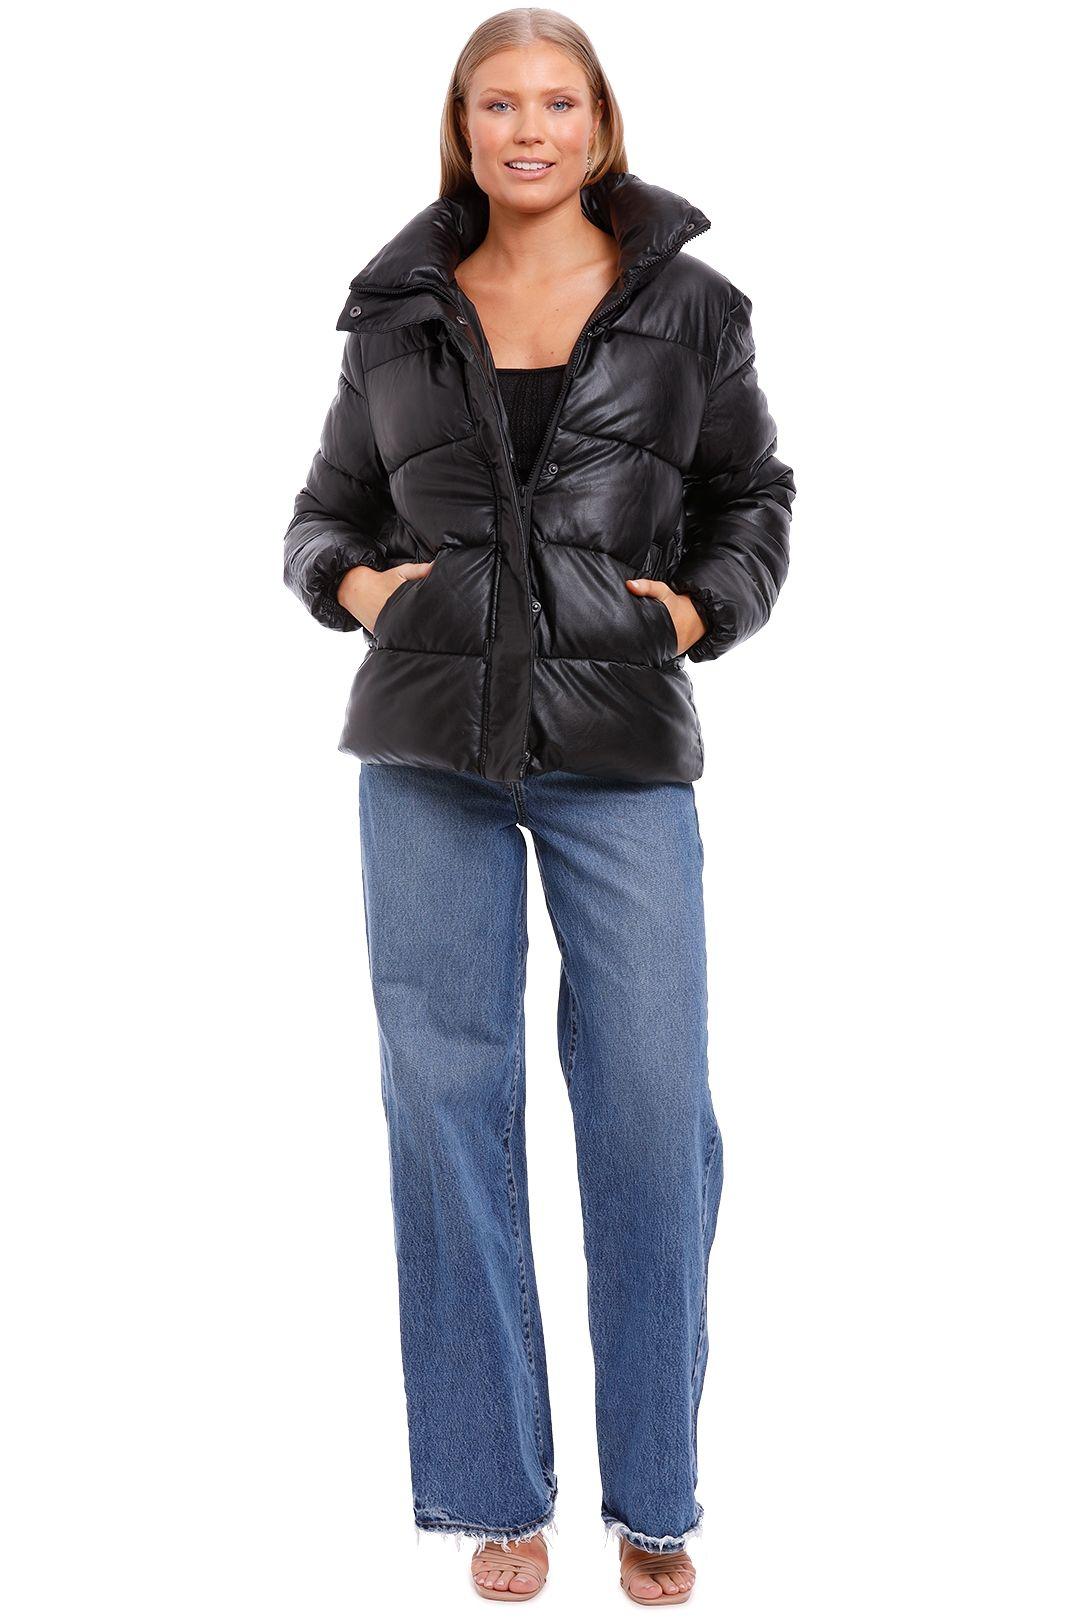 Unreal Fur Major Tom Puffer Jacket Black